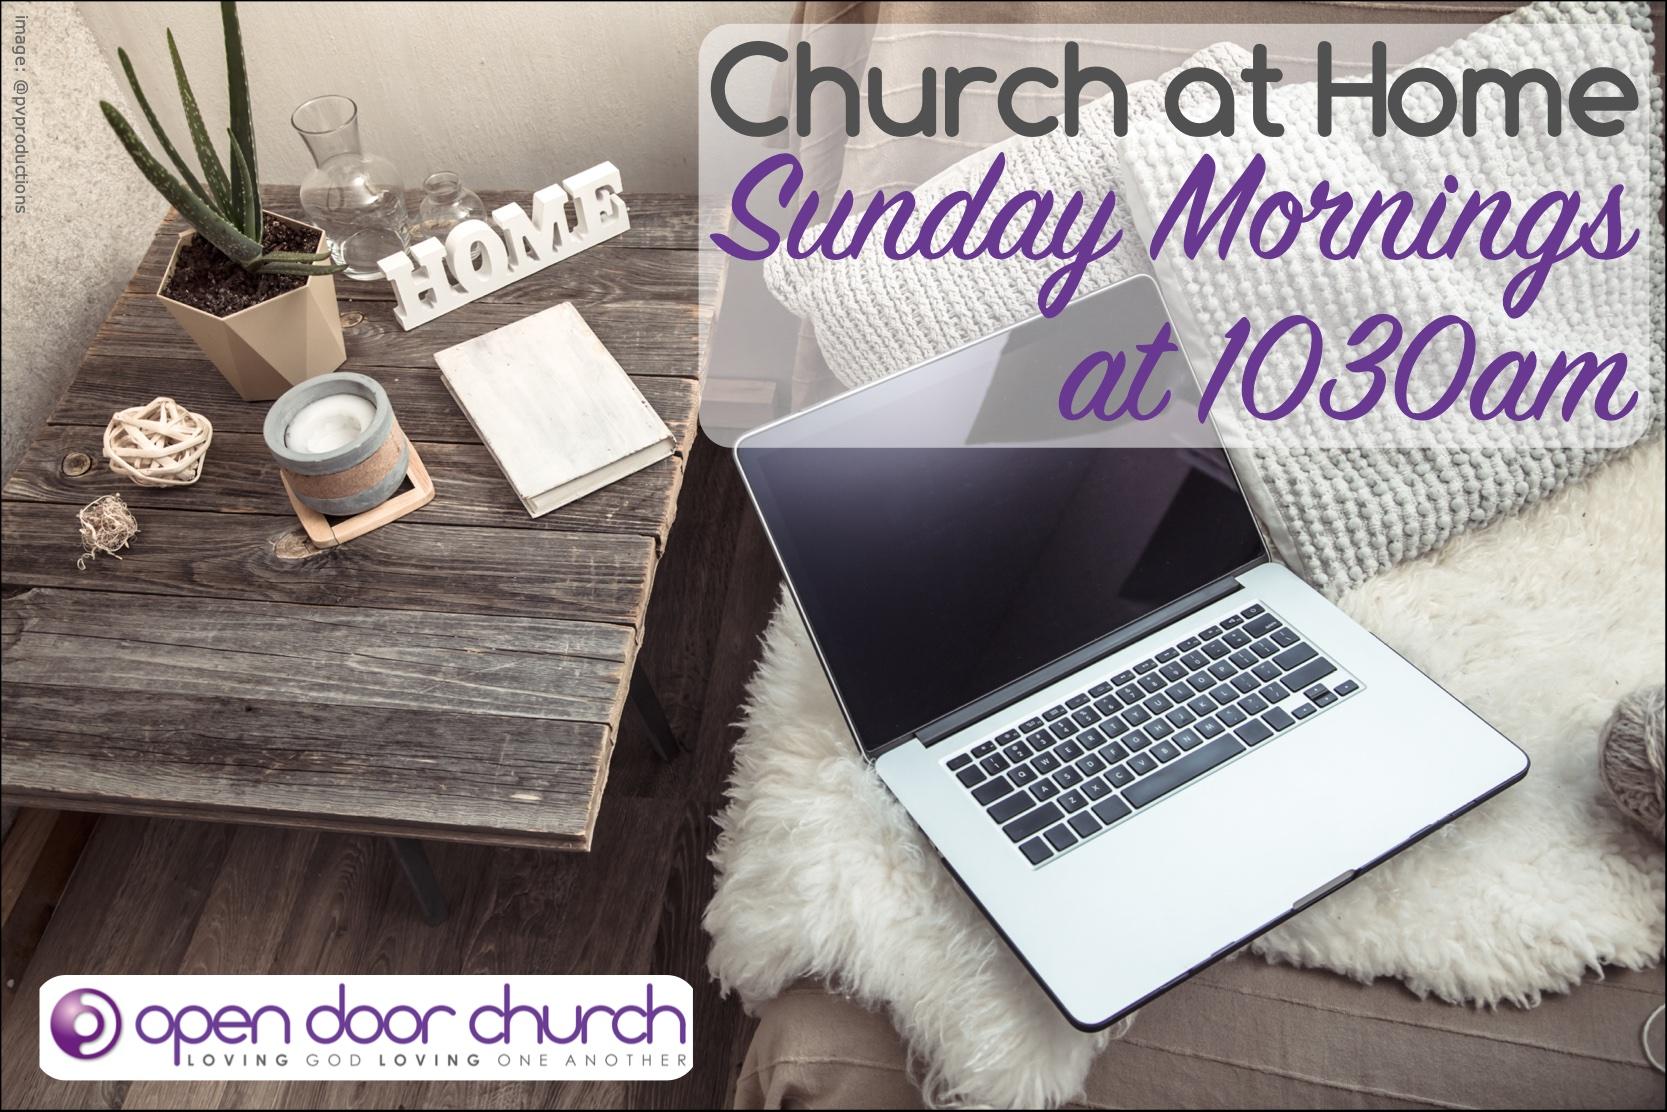 New Church at Home